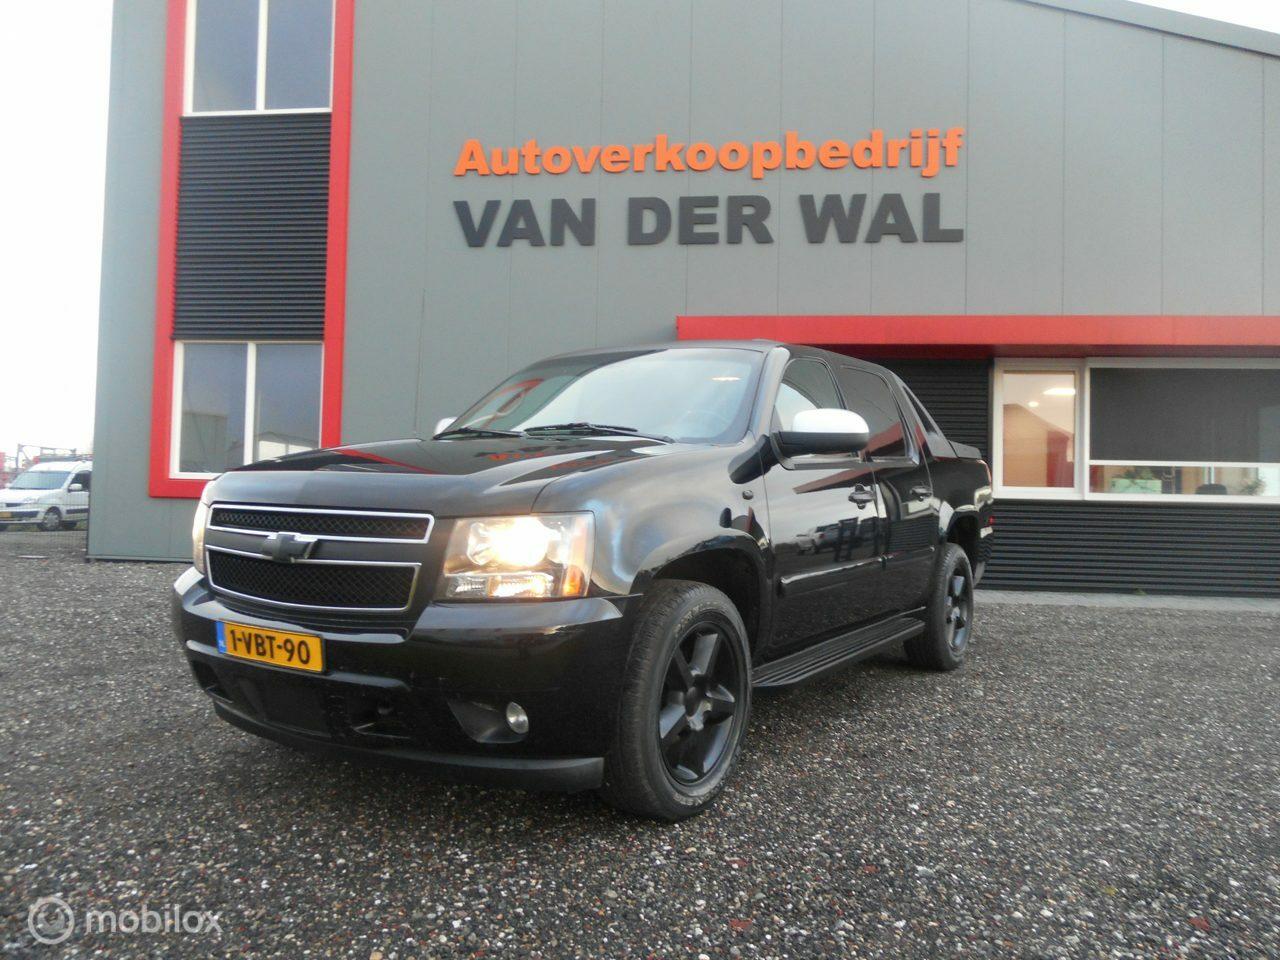 Chevrolet Avalanche - USA 5.3 V8 2WD KMGEEN MILS/LTZ/CLIMATECONTROL/LEER/NAVIGATIE